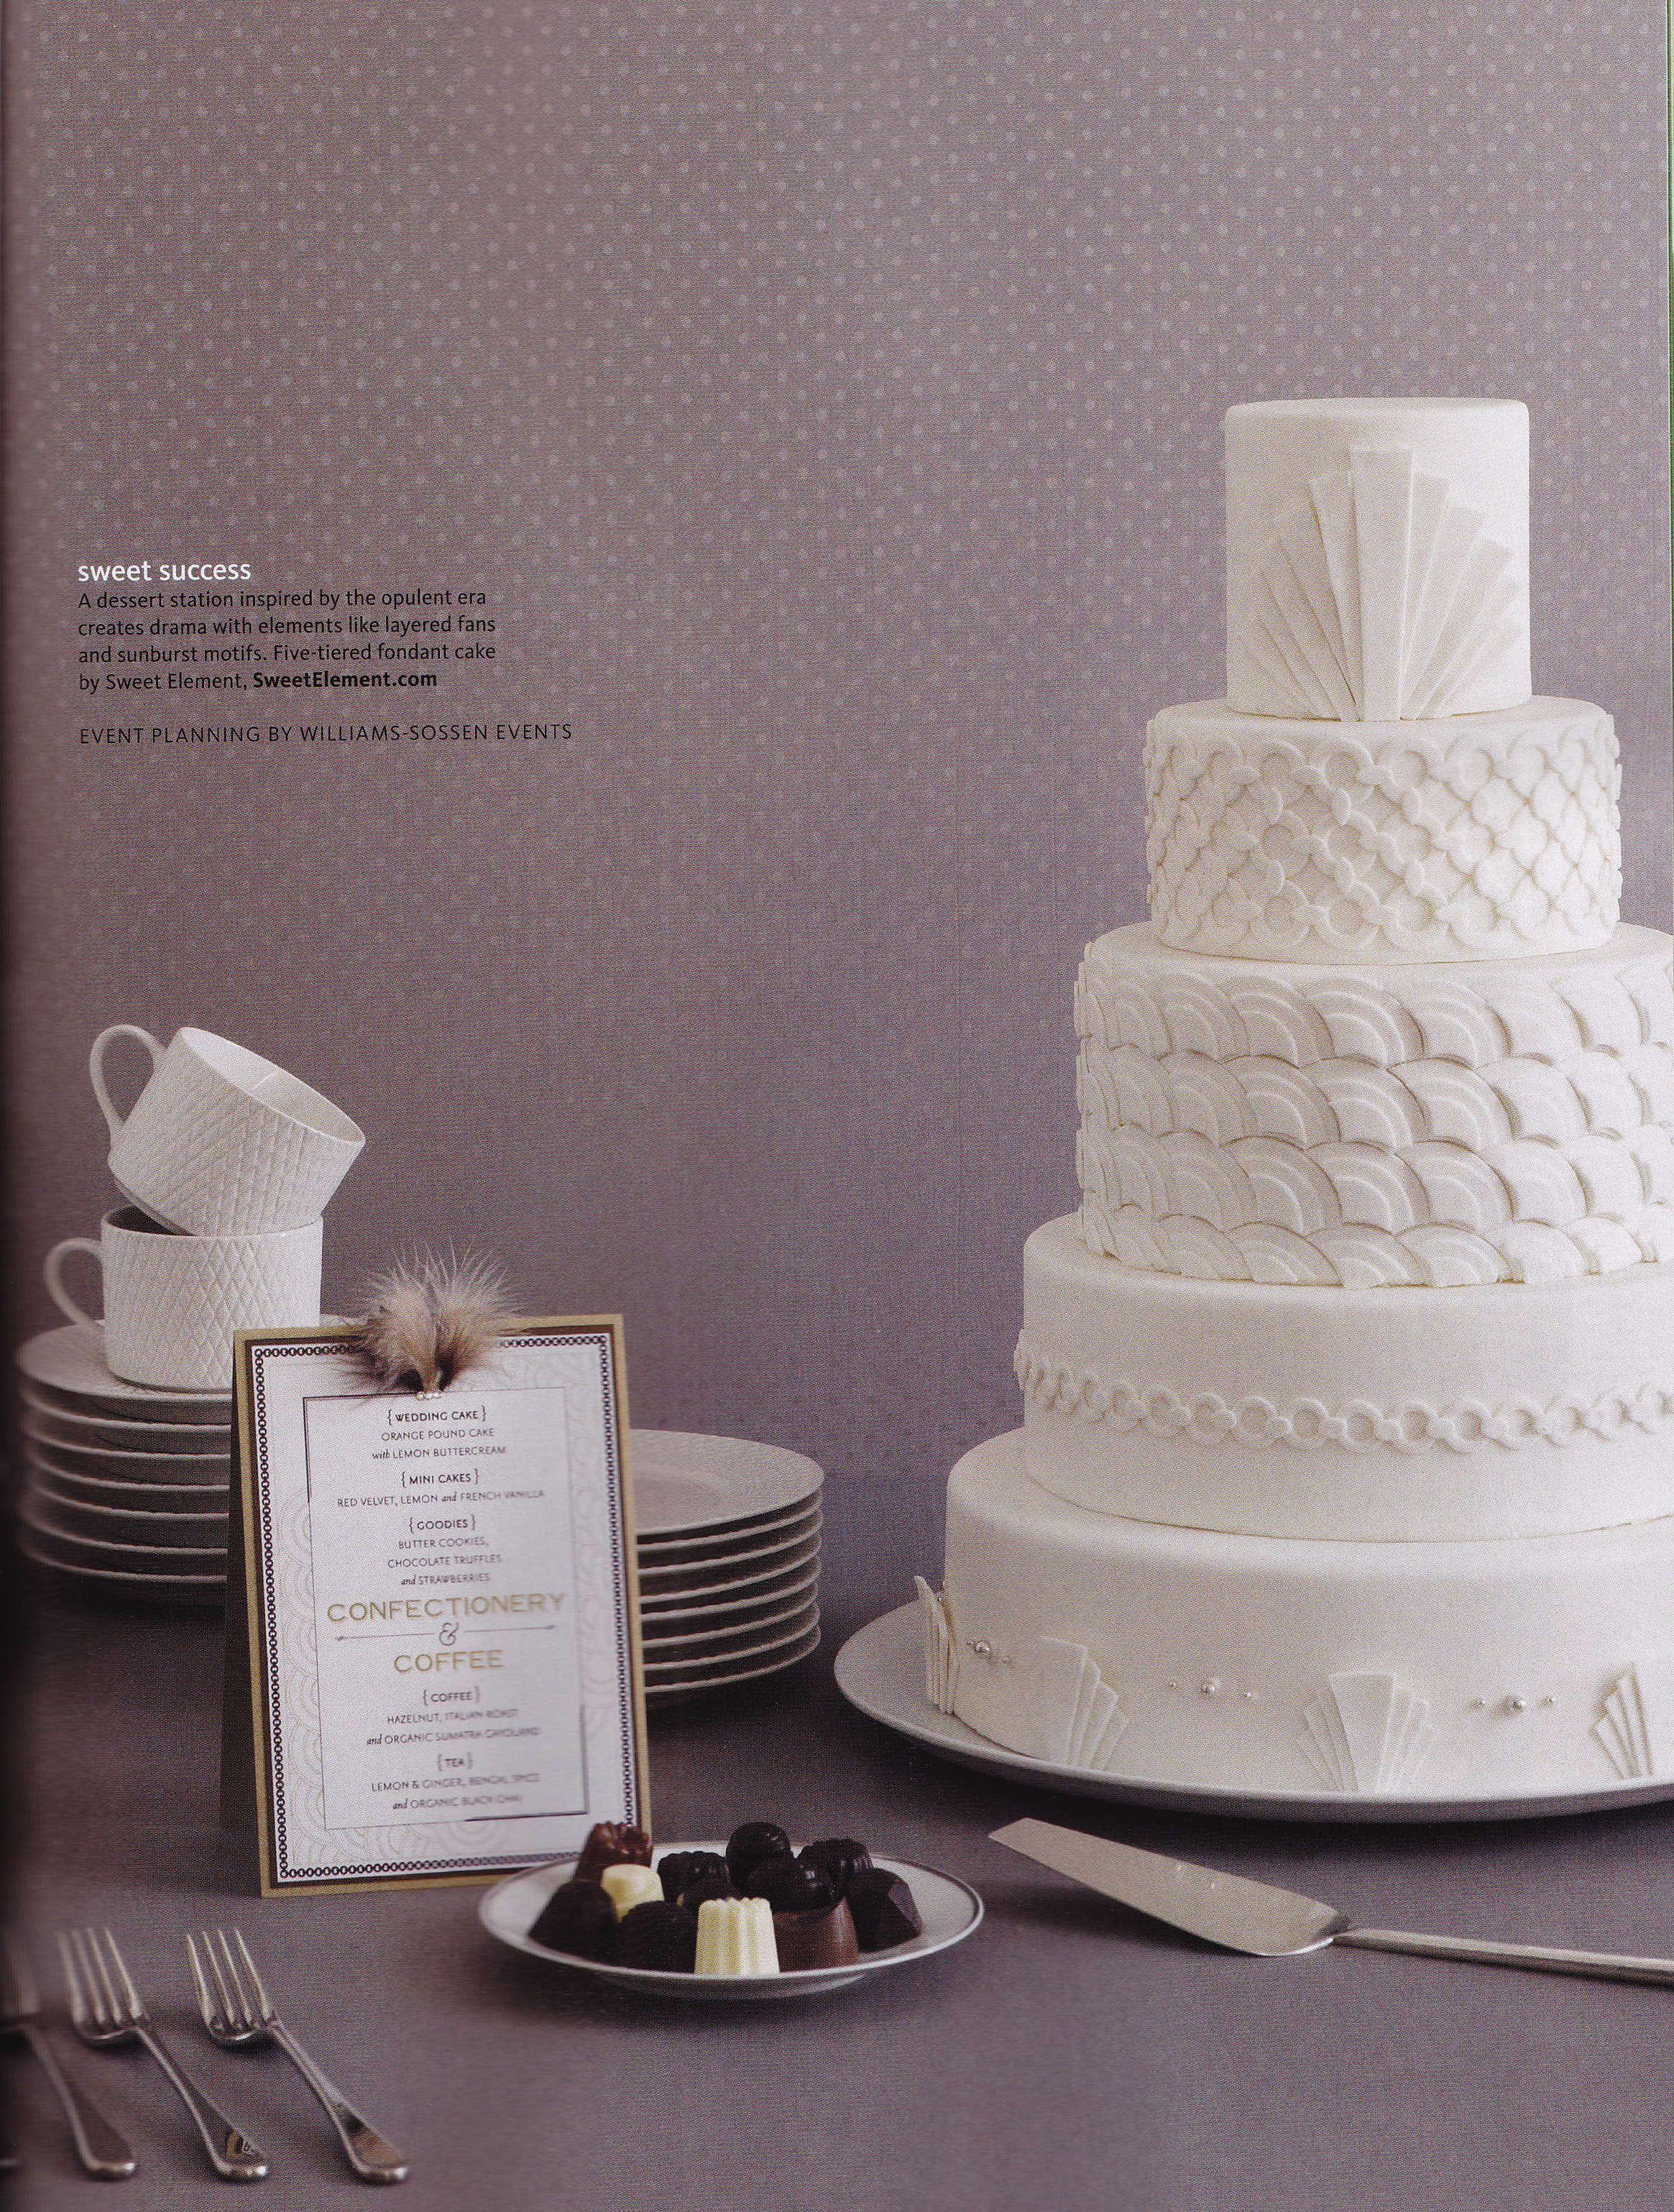 Wedding Cakes We Love on Pinterest